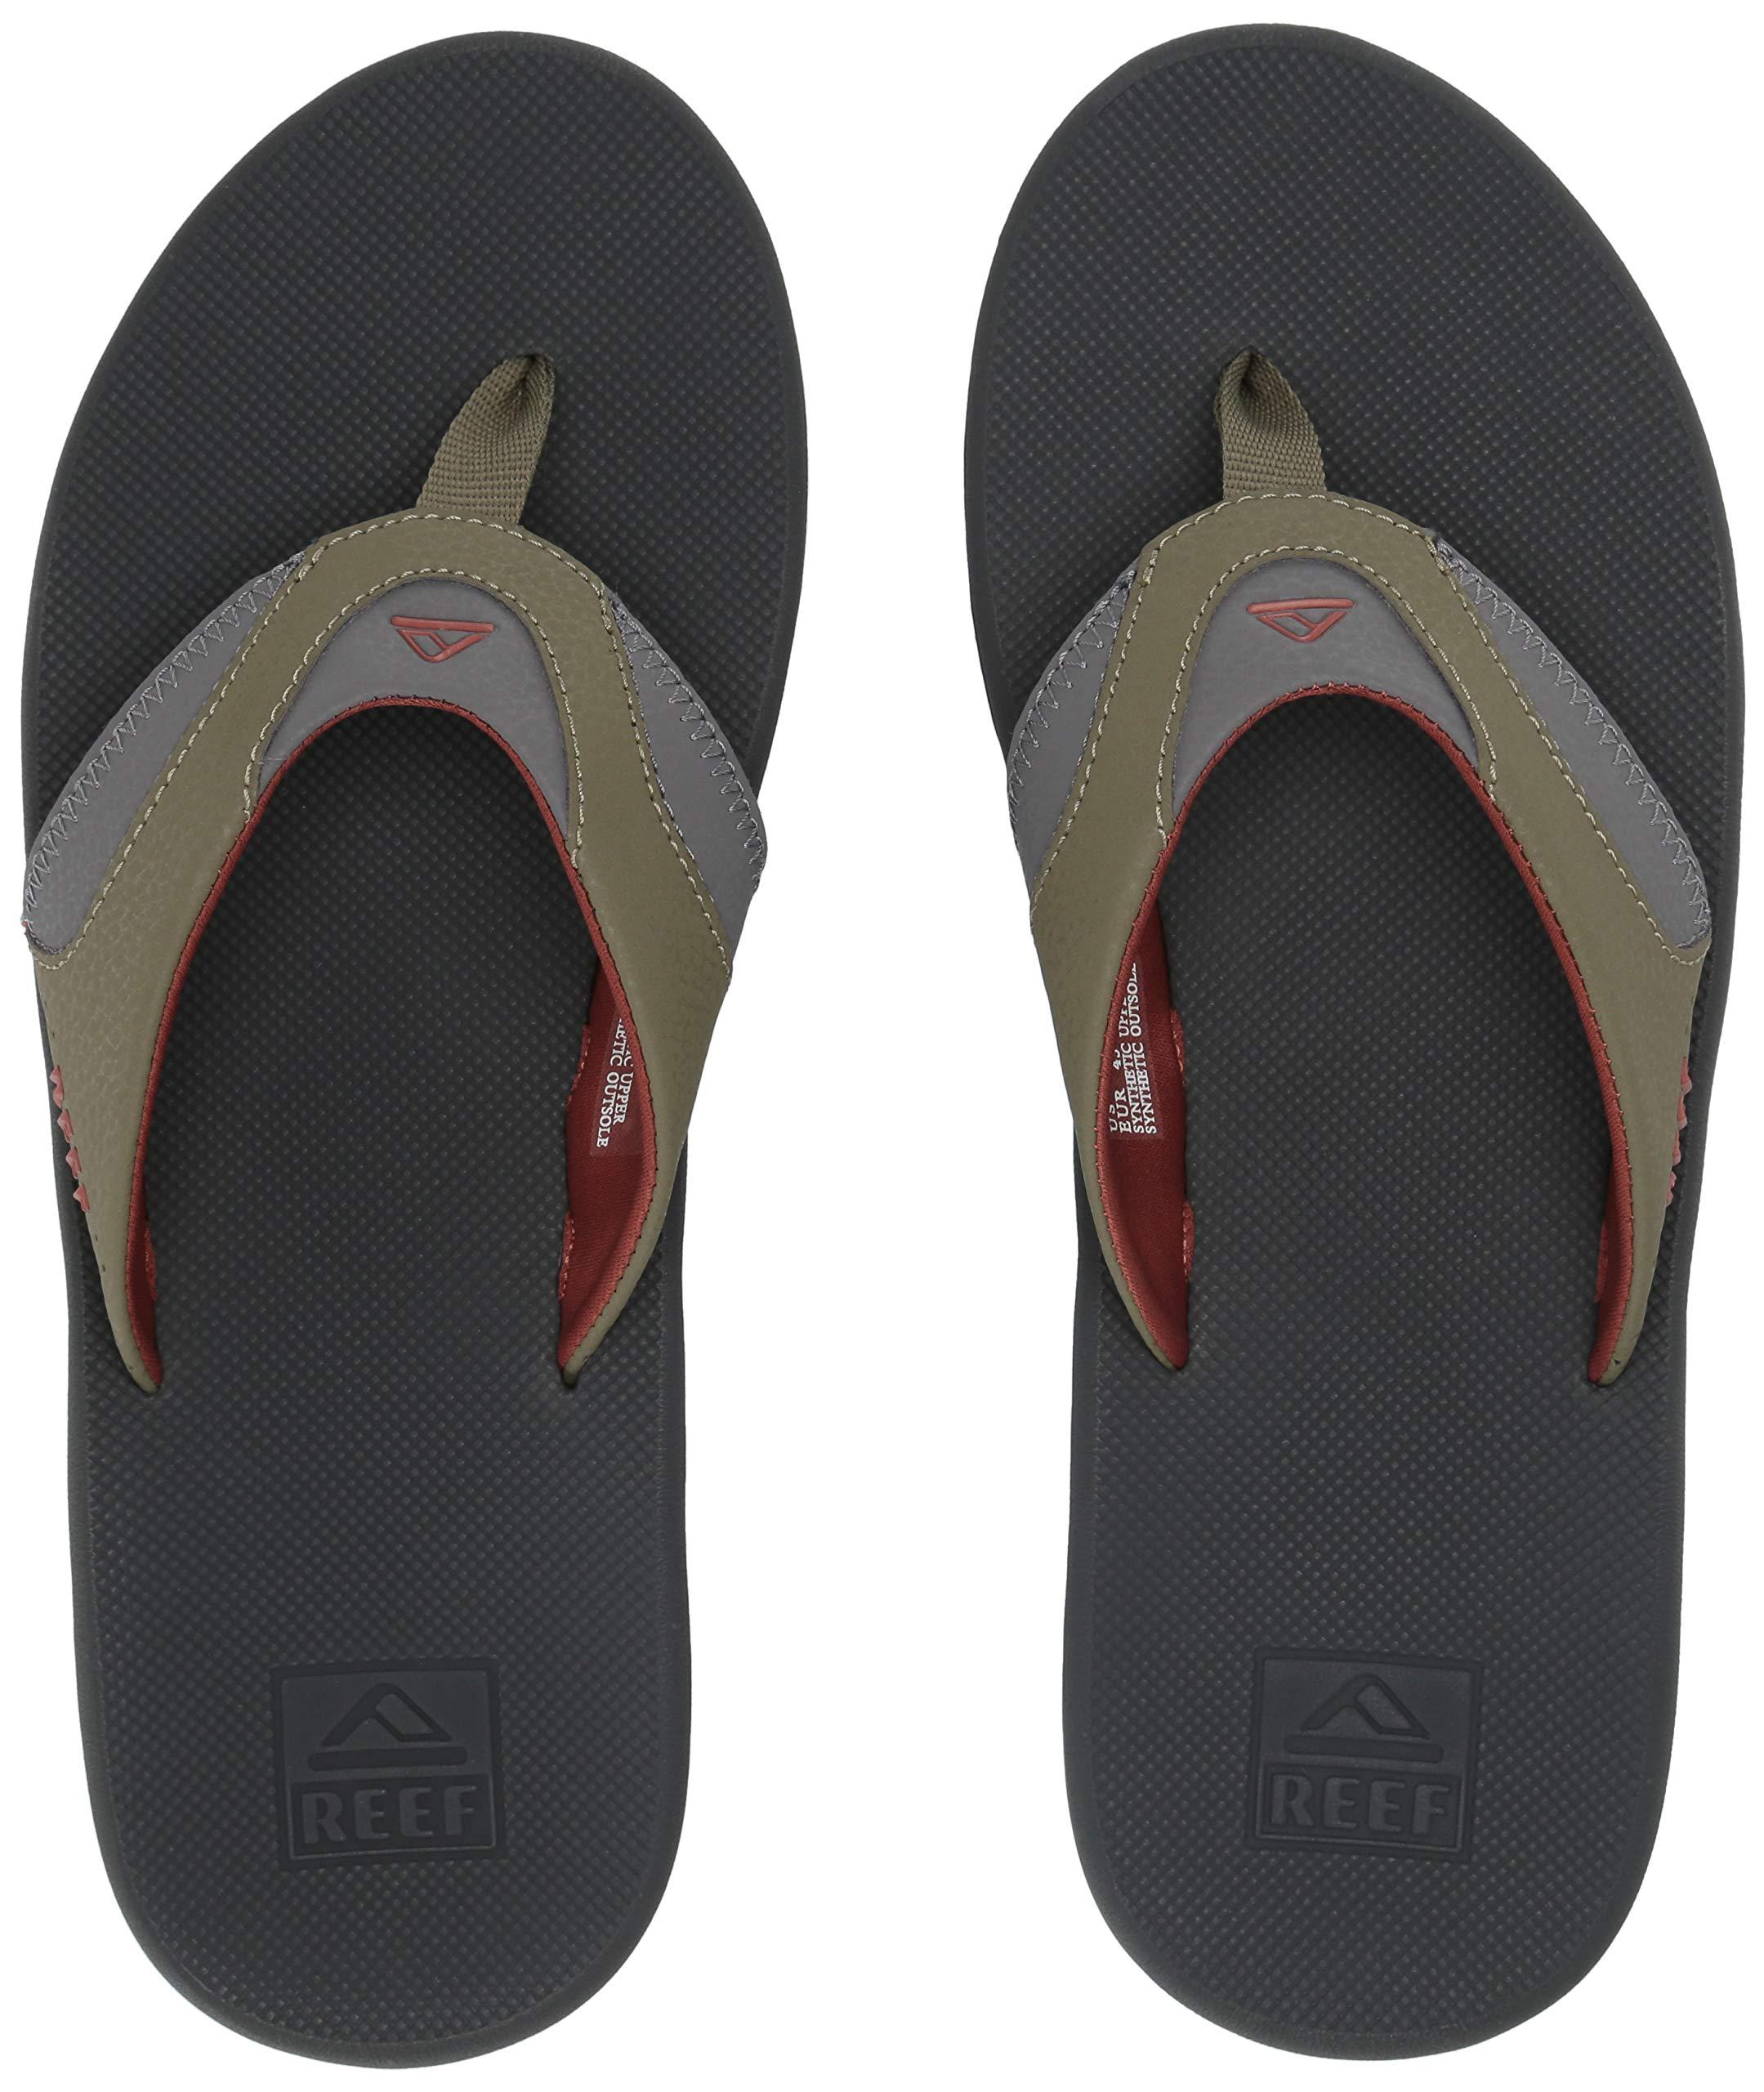 Reef Men's Fanning Sandal, Olive/Rust, 130 M US